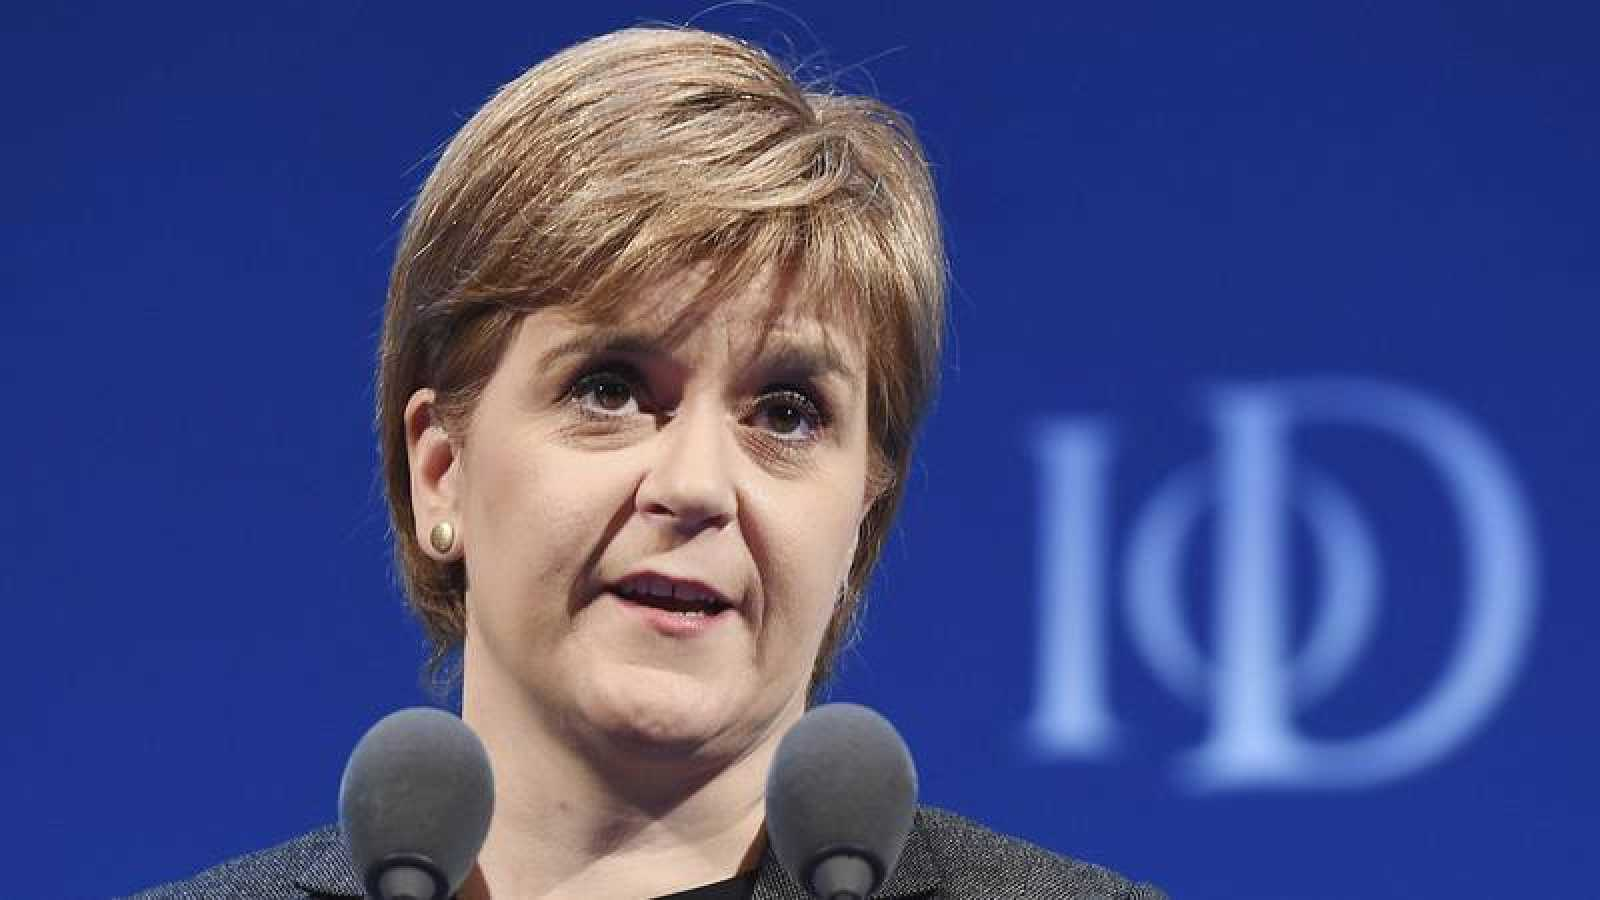 Foto de archivo de la ministra principal de Escocia, Nicola Sturgeon.